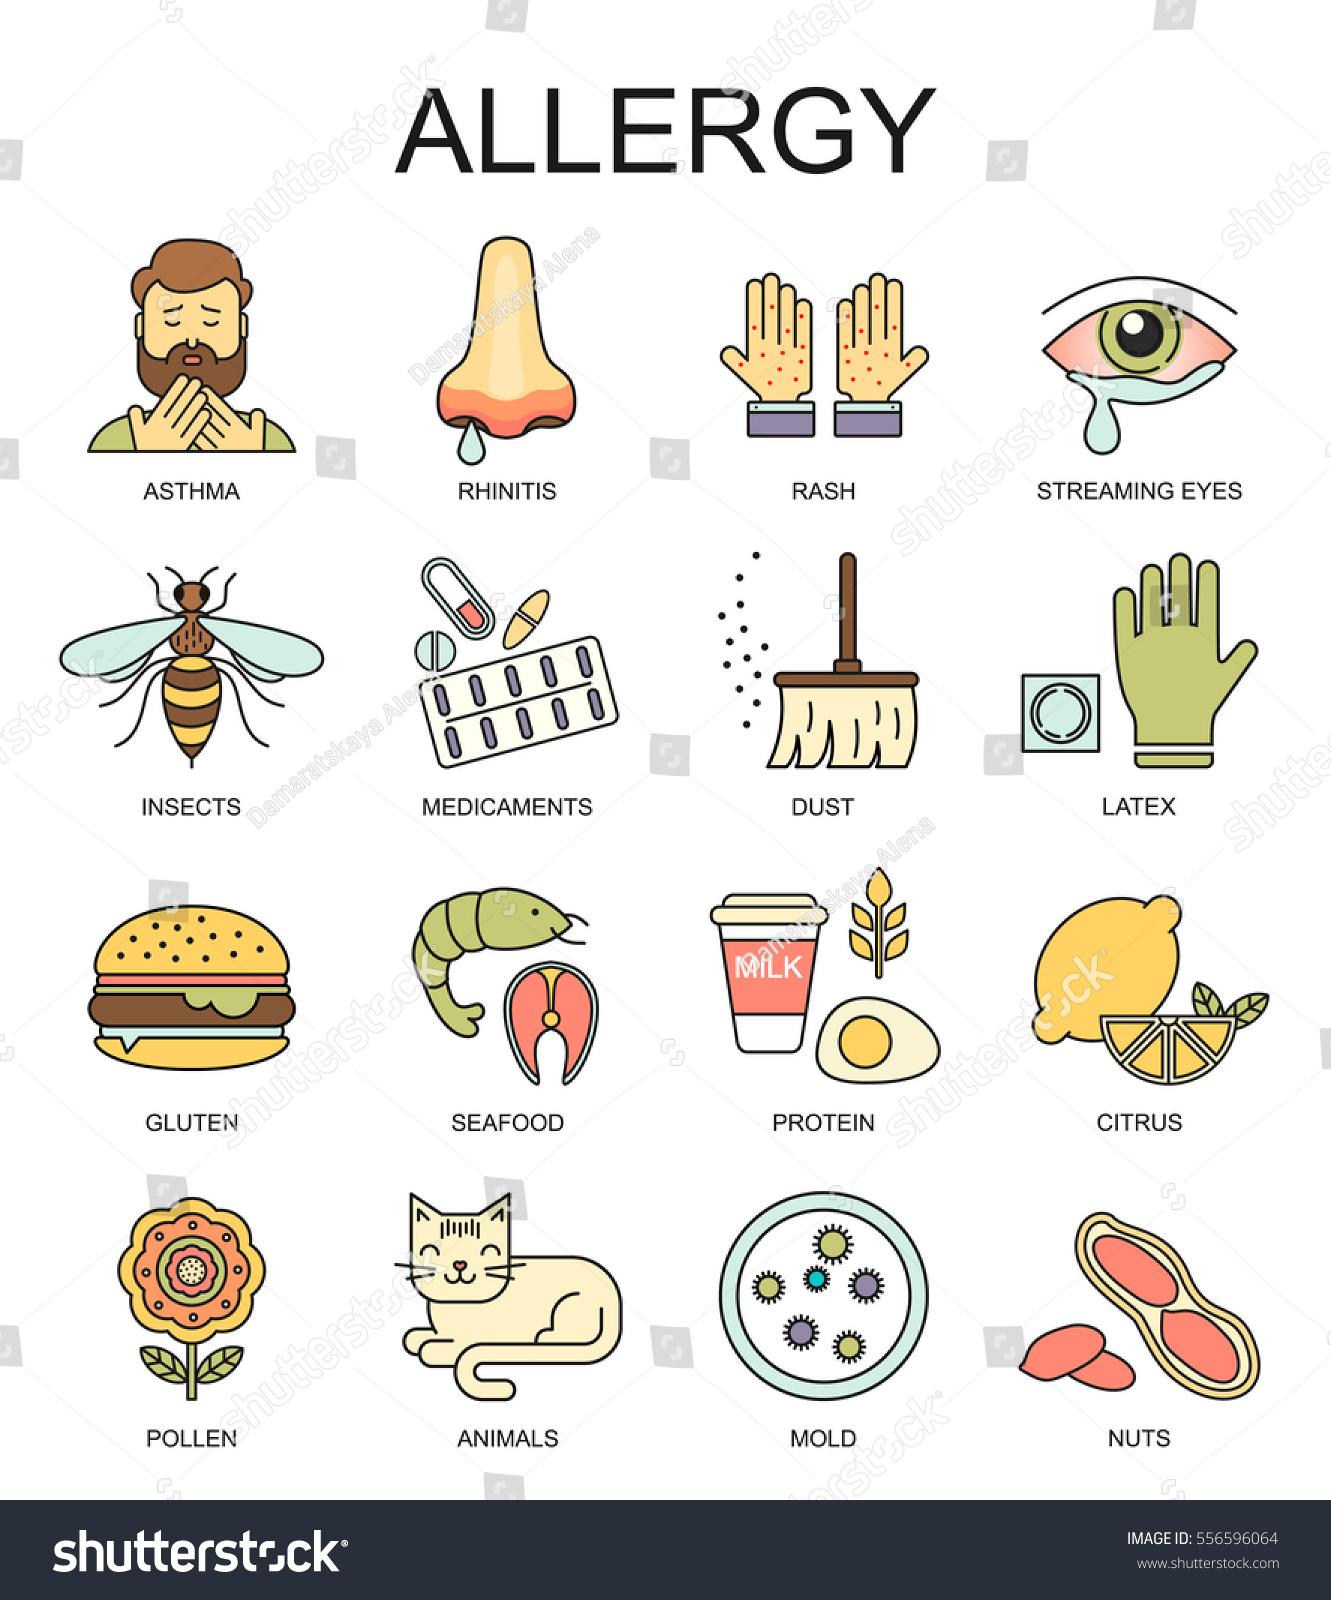 Allergy Symptoms Linear Illustration Most Common Stock ...